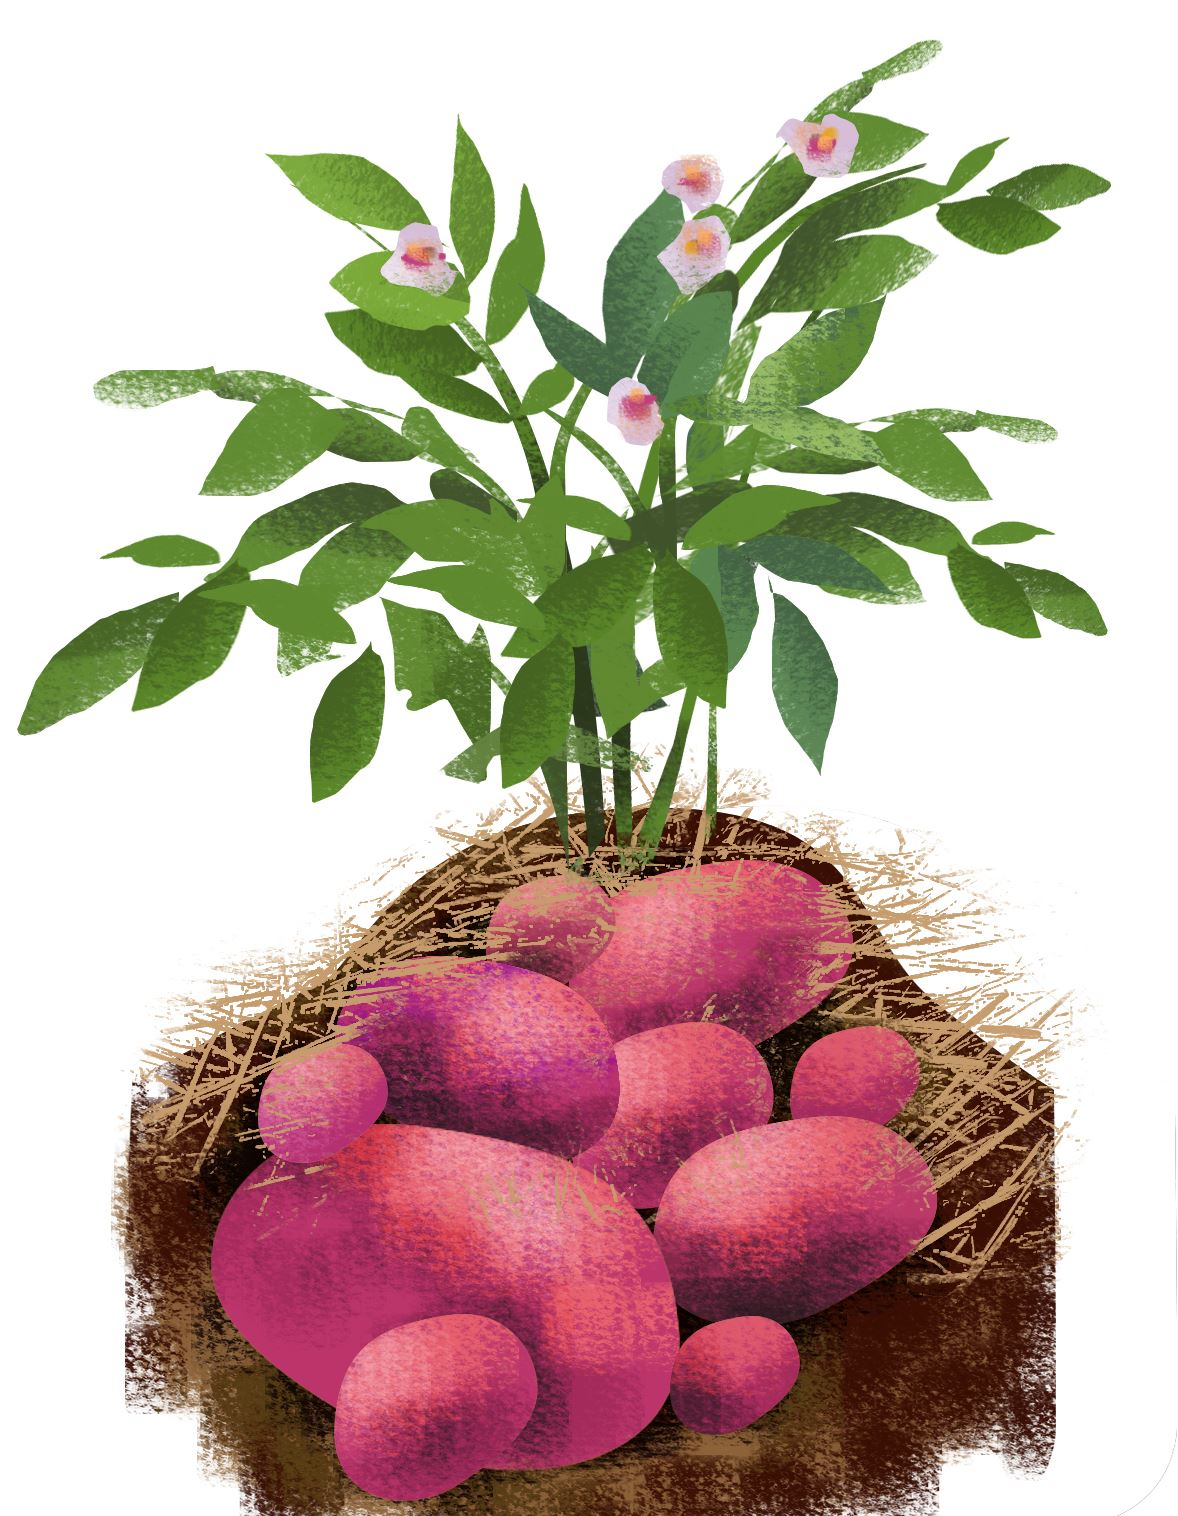 Miriam_Potatoes062614_dm Potato plant.